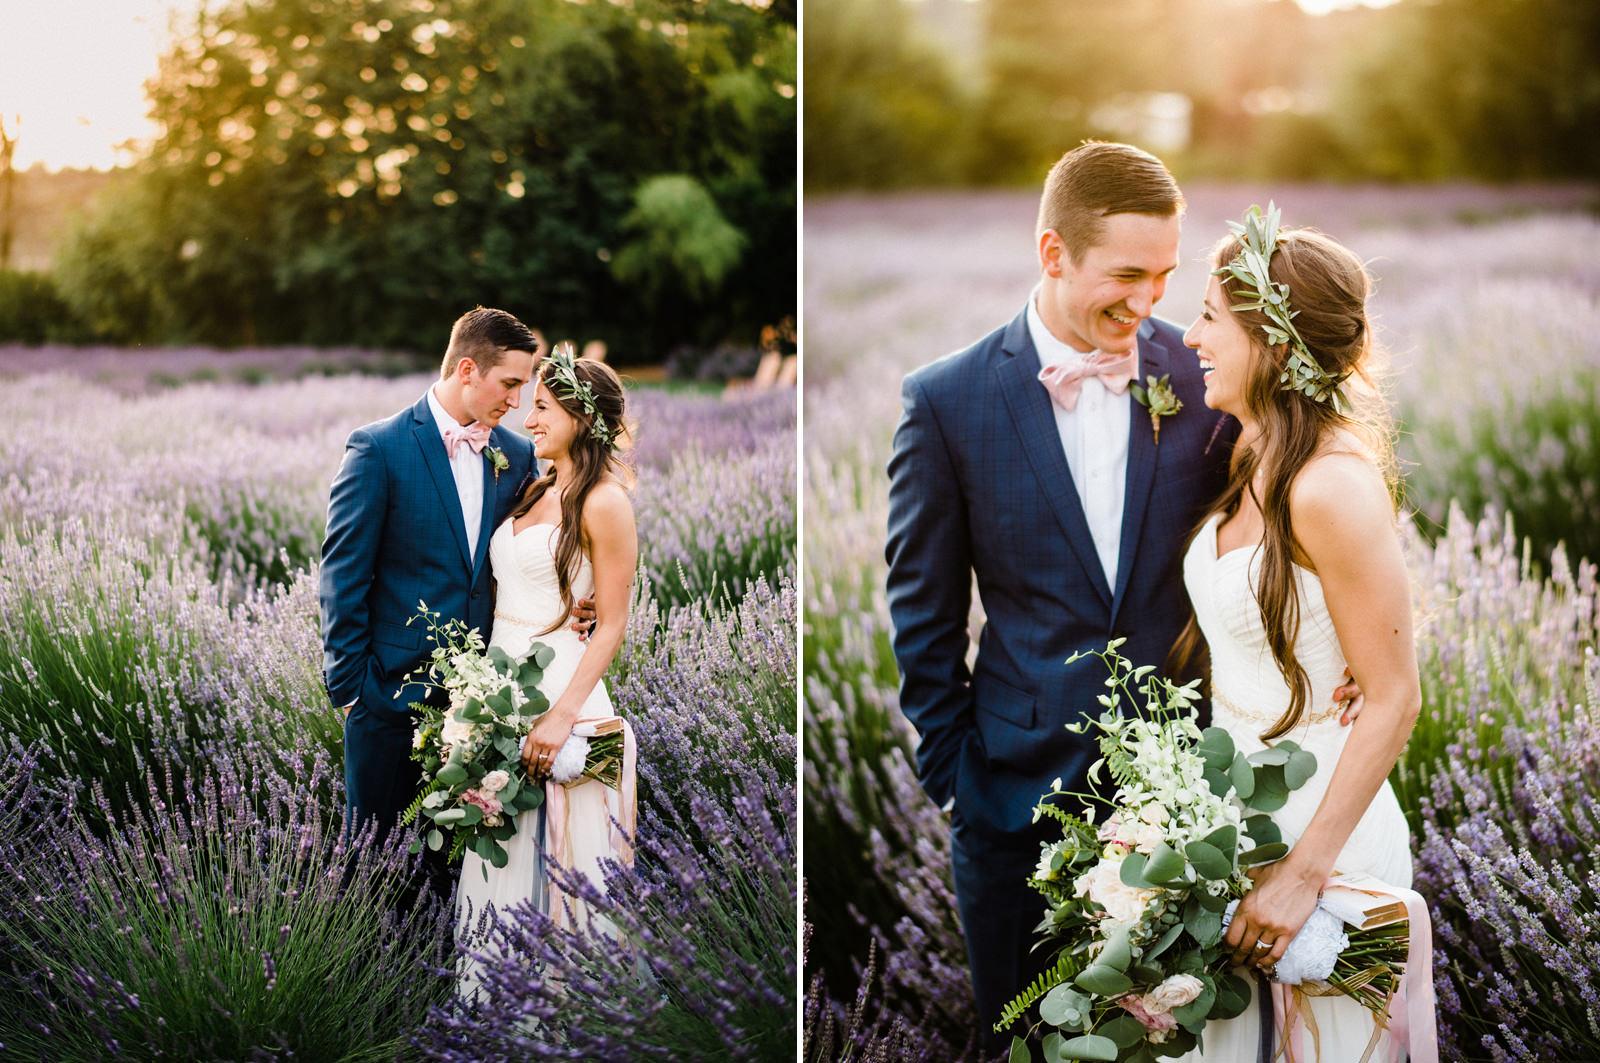 094-woodinville-lavendar-farm-wedding-with-golden-glowy-photos.jpg